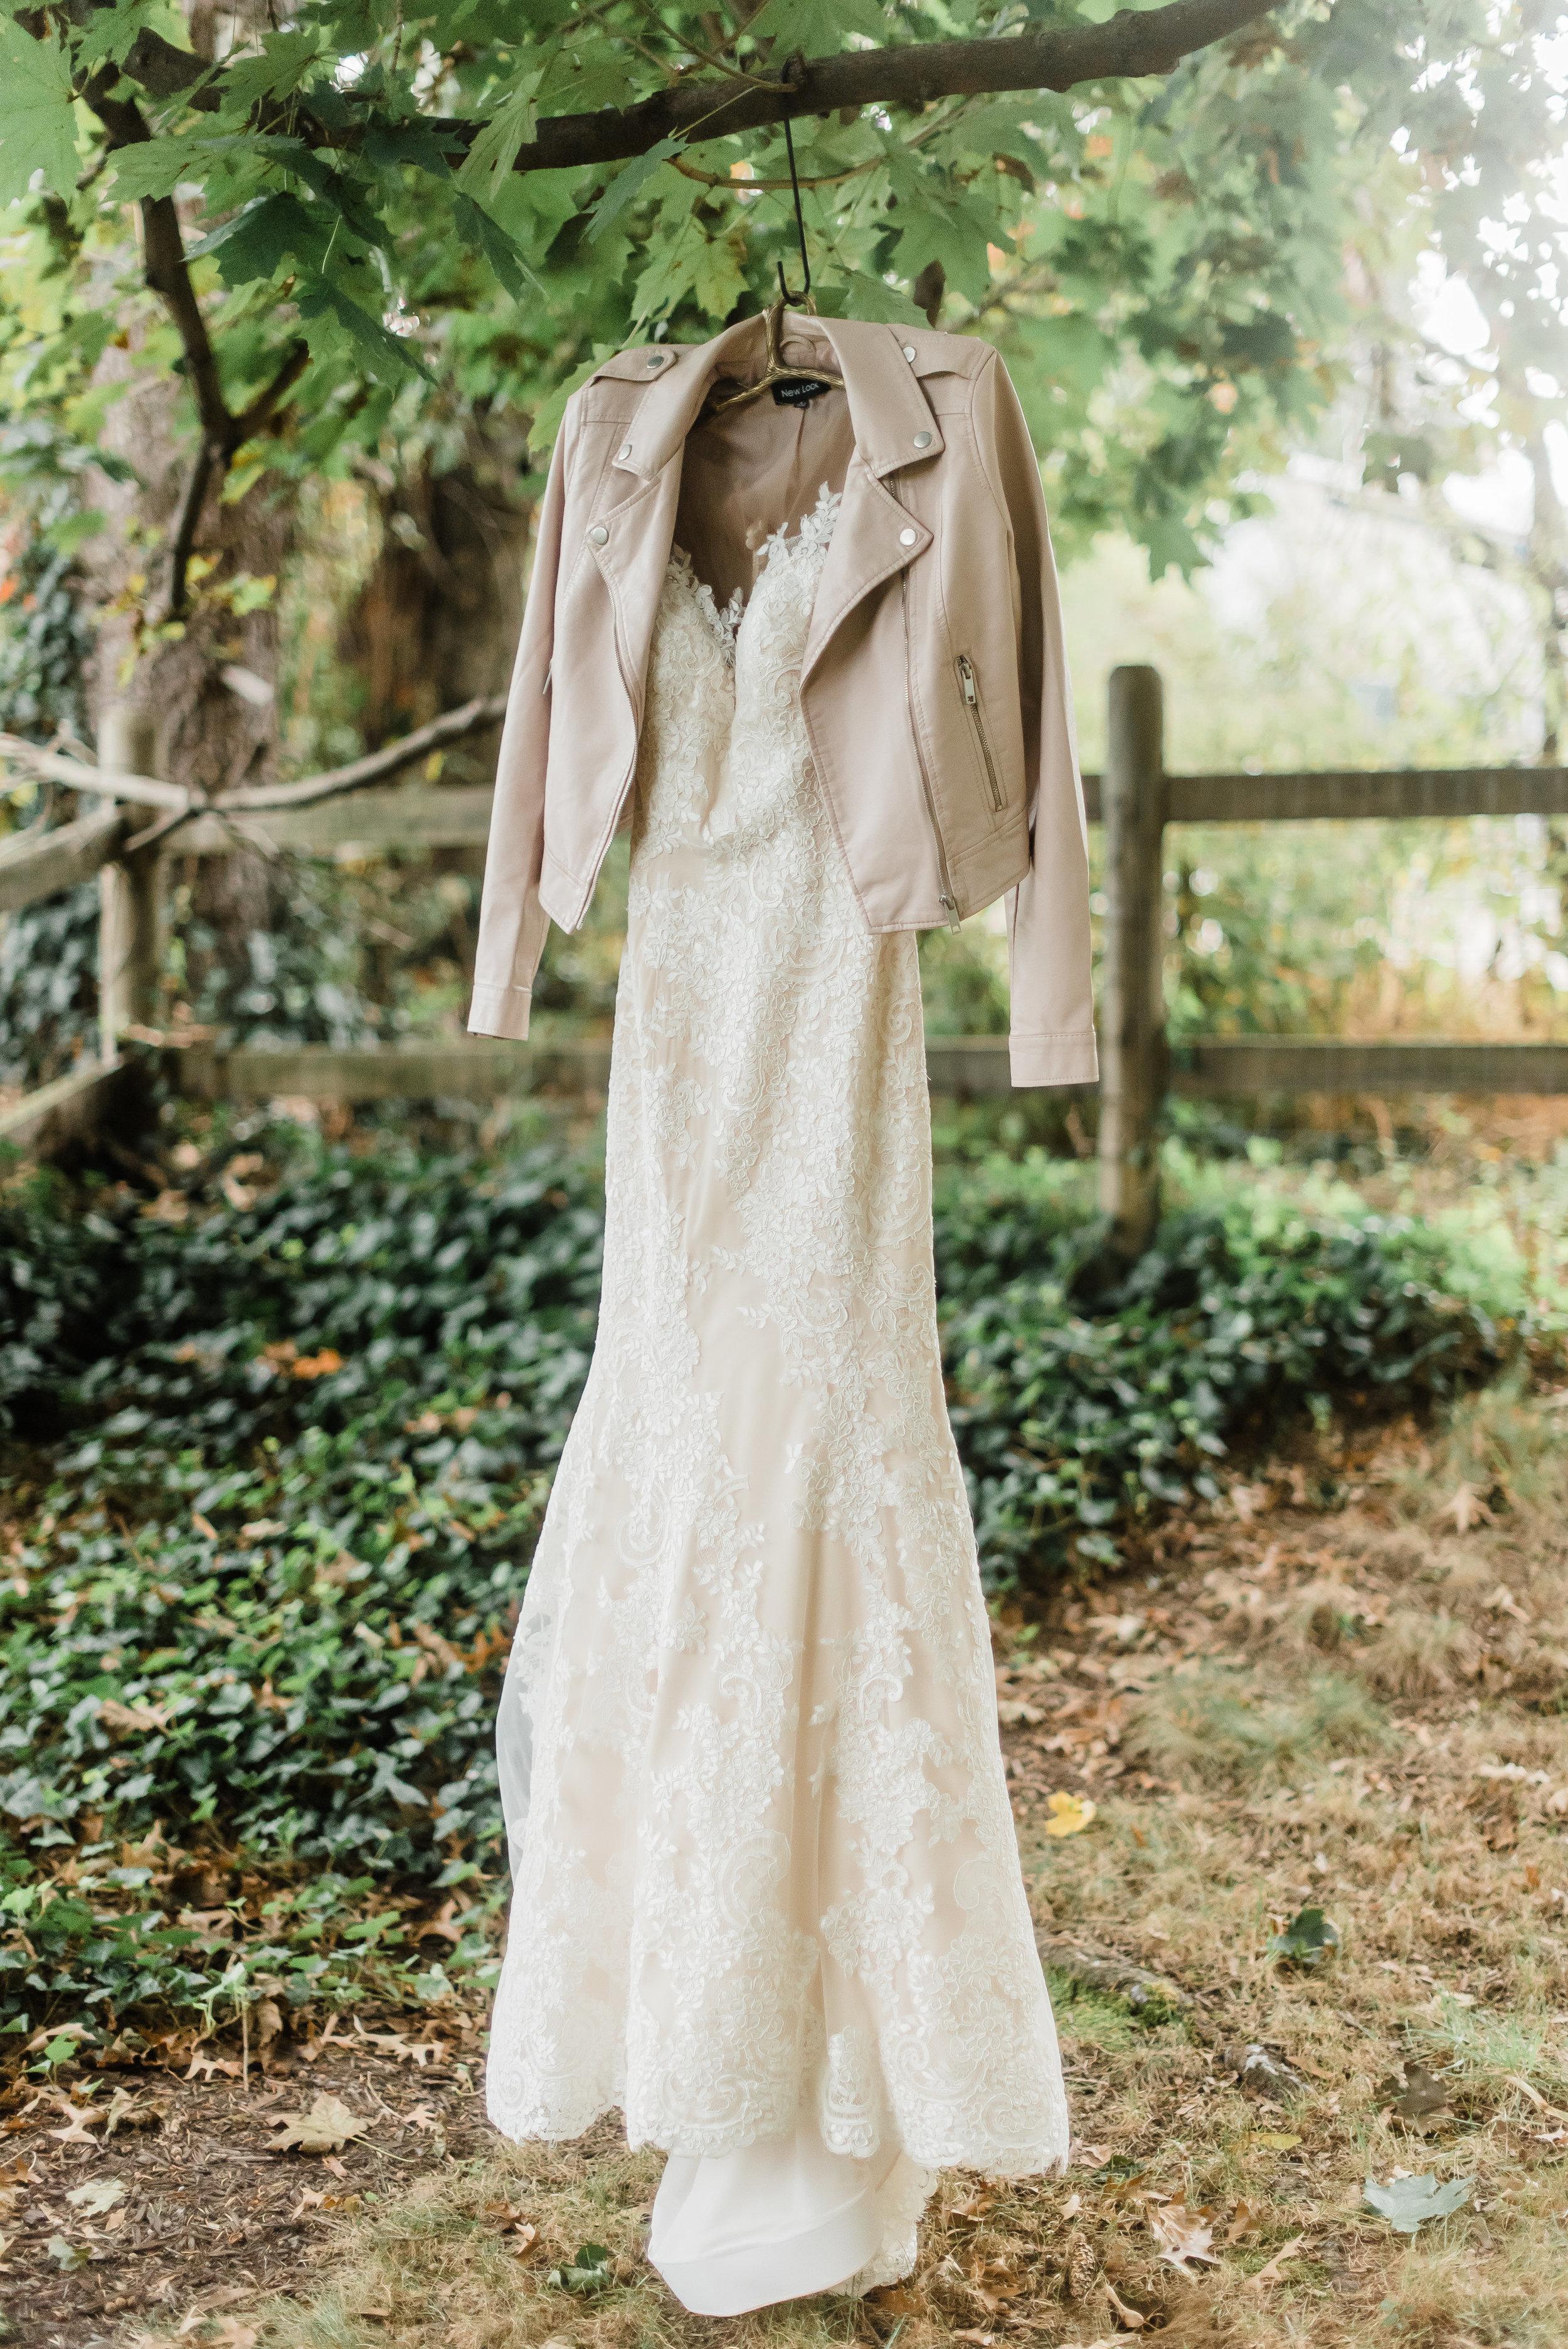 pittsburgh-wedding-photographer-modern-greenery-edgewoodclub-boho0123.jpg